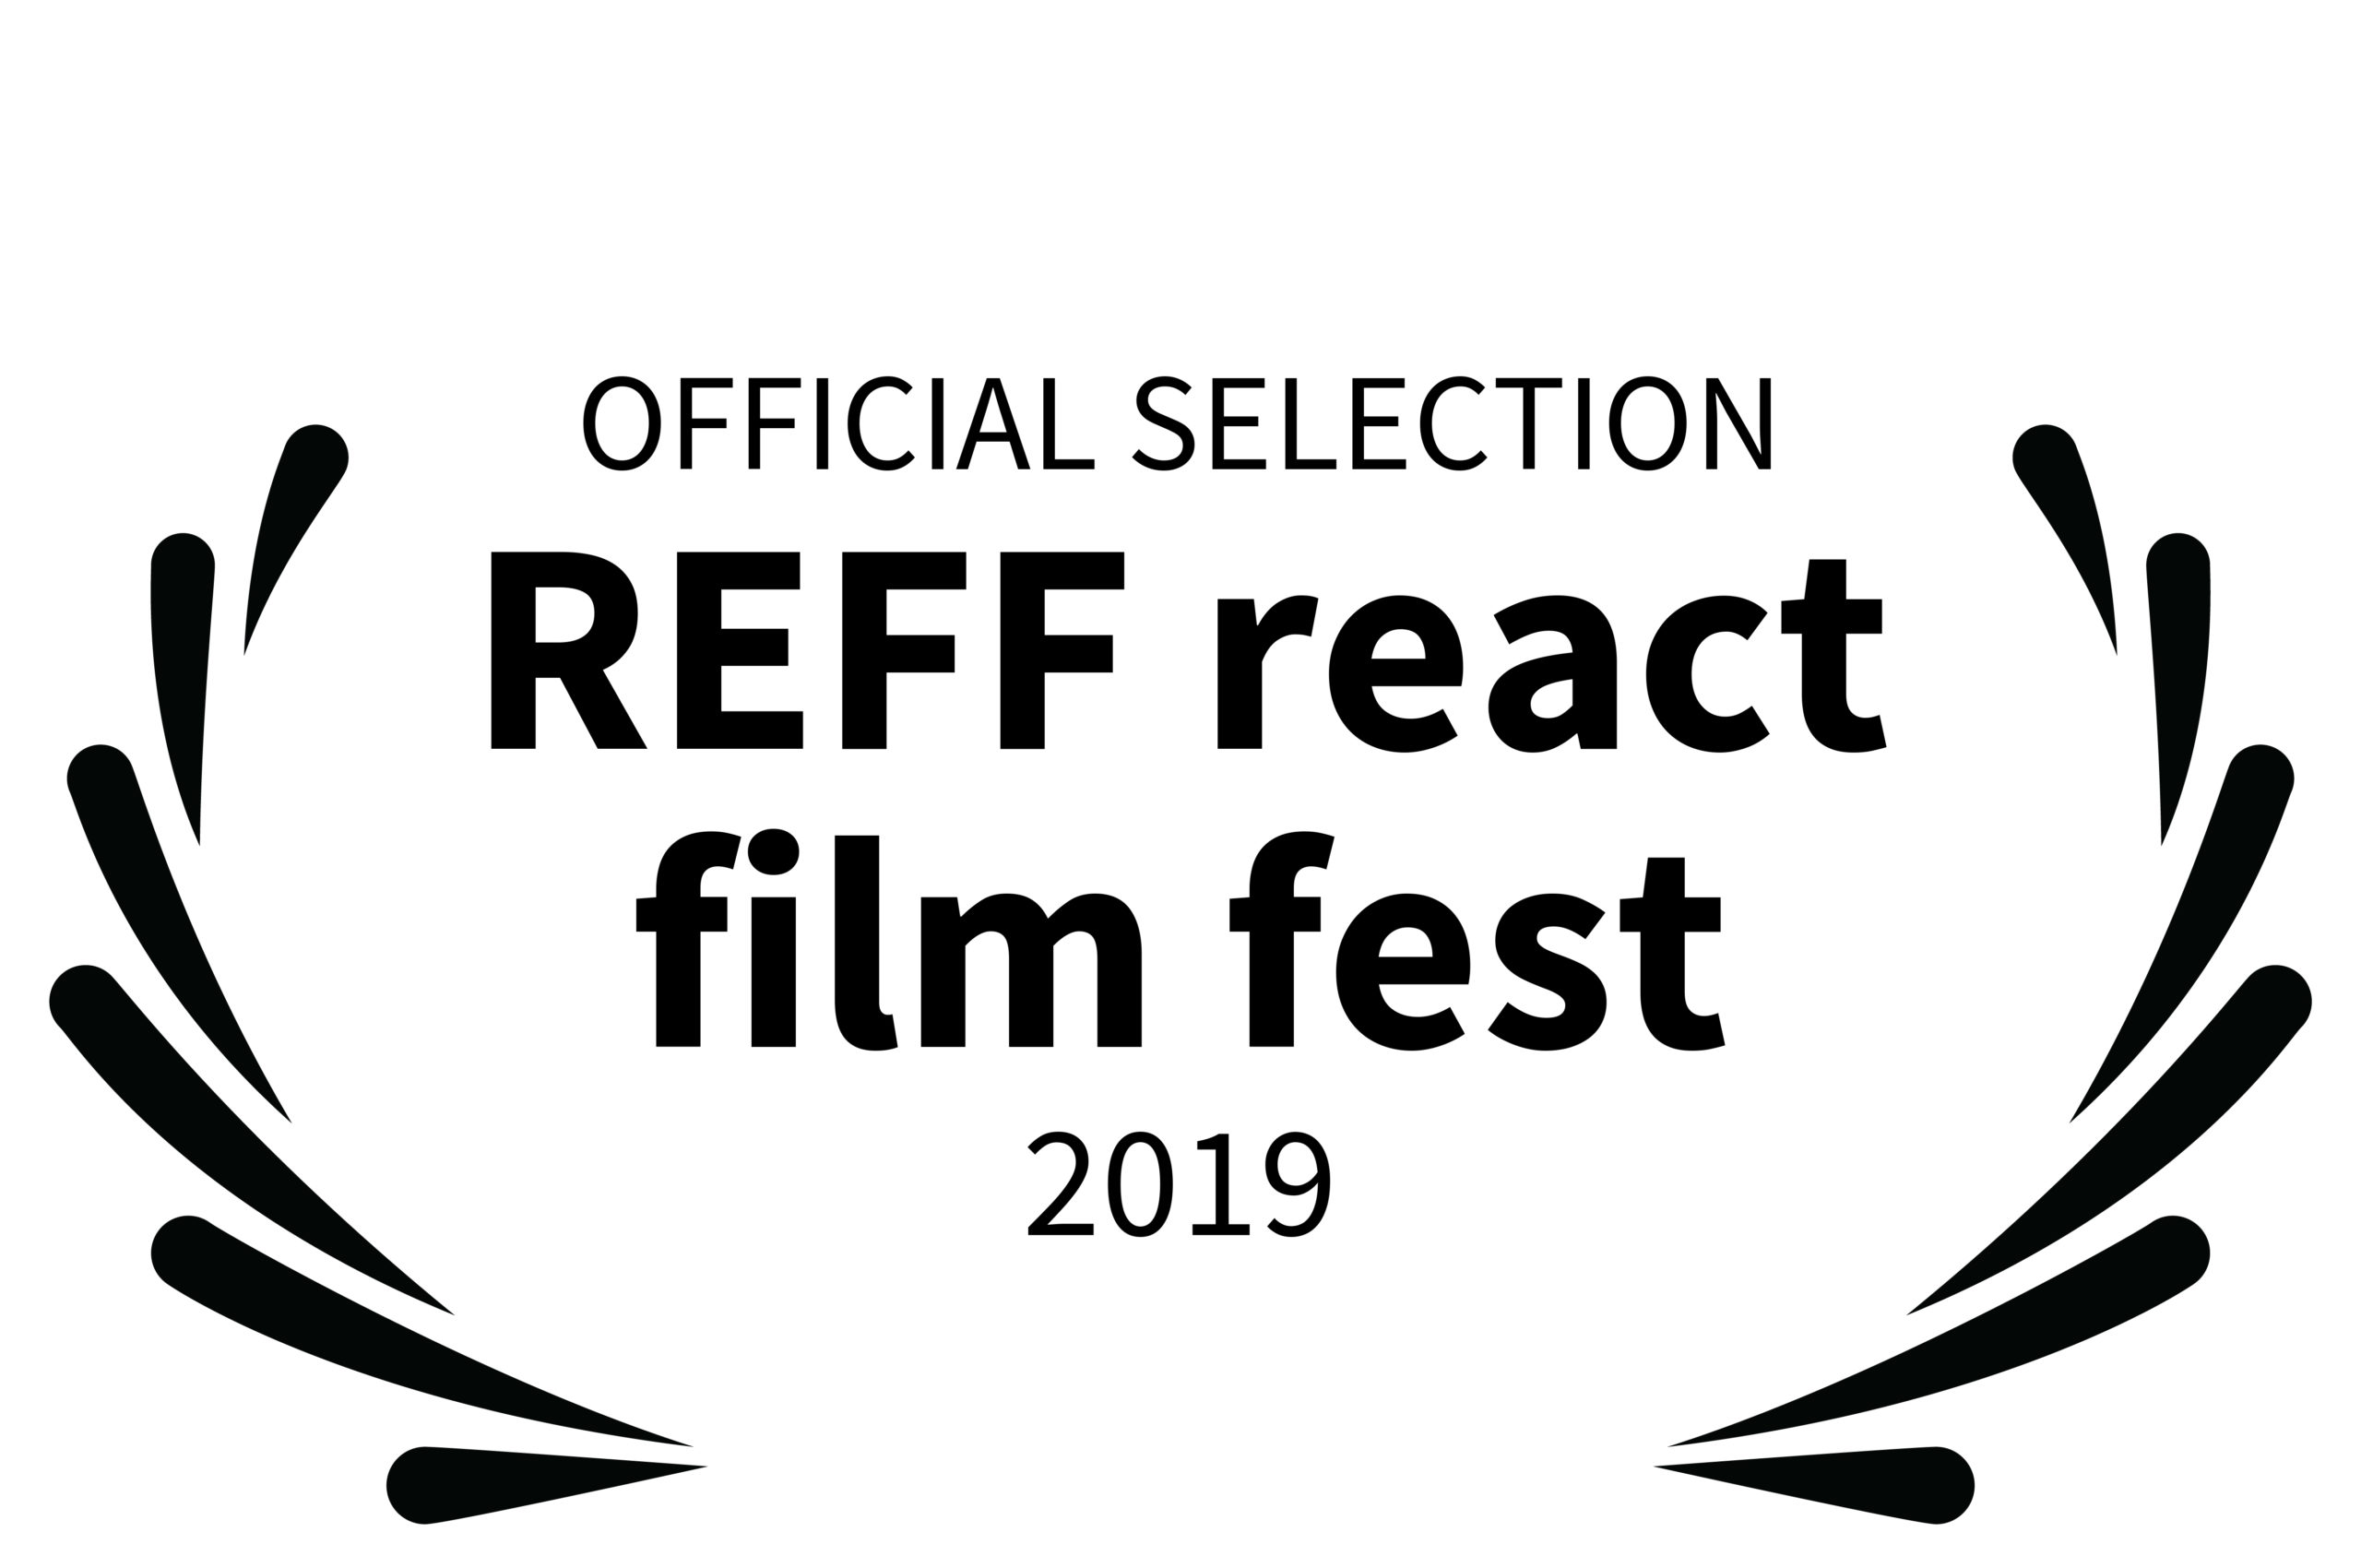 white sfondoOFFICIALSELECTION-REFFreactfilmfest-2019